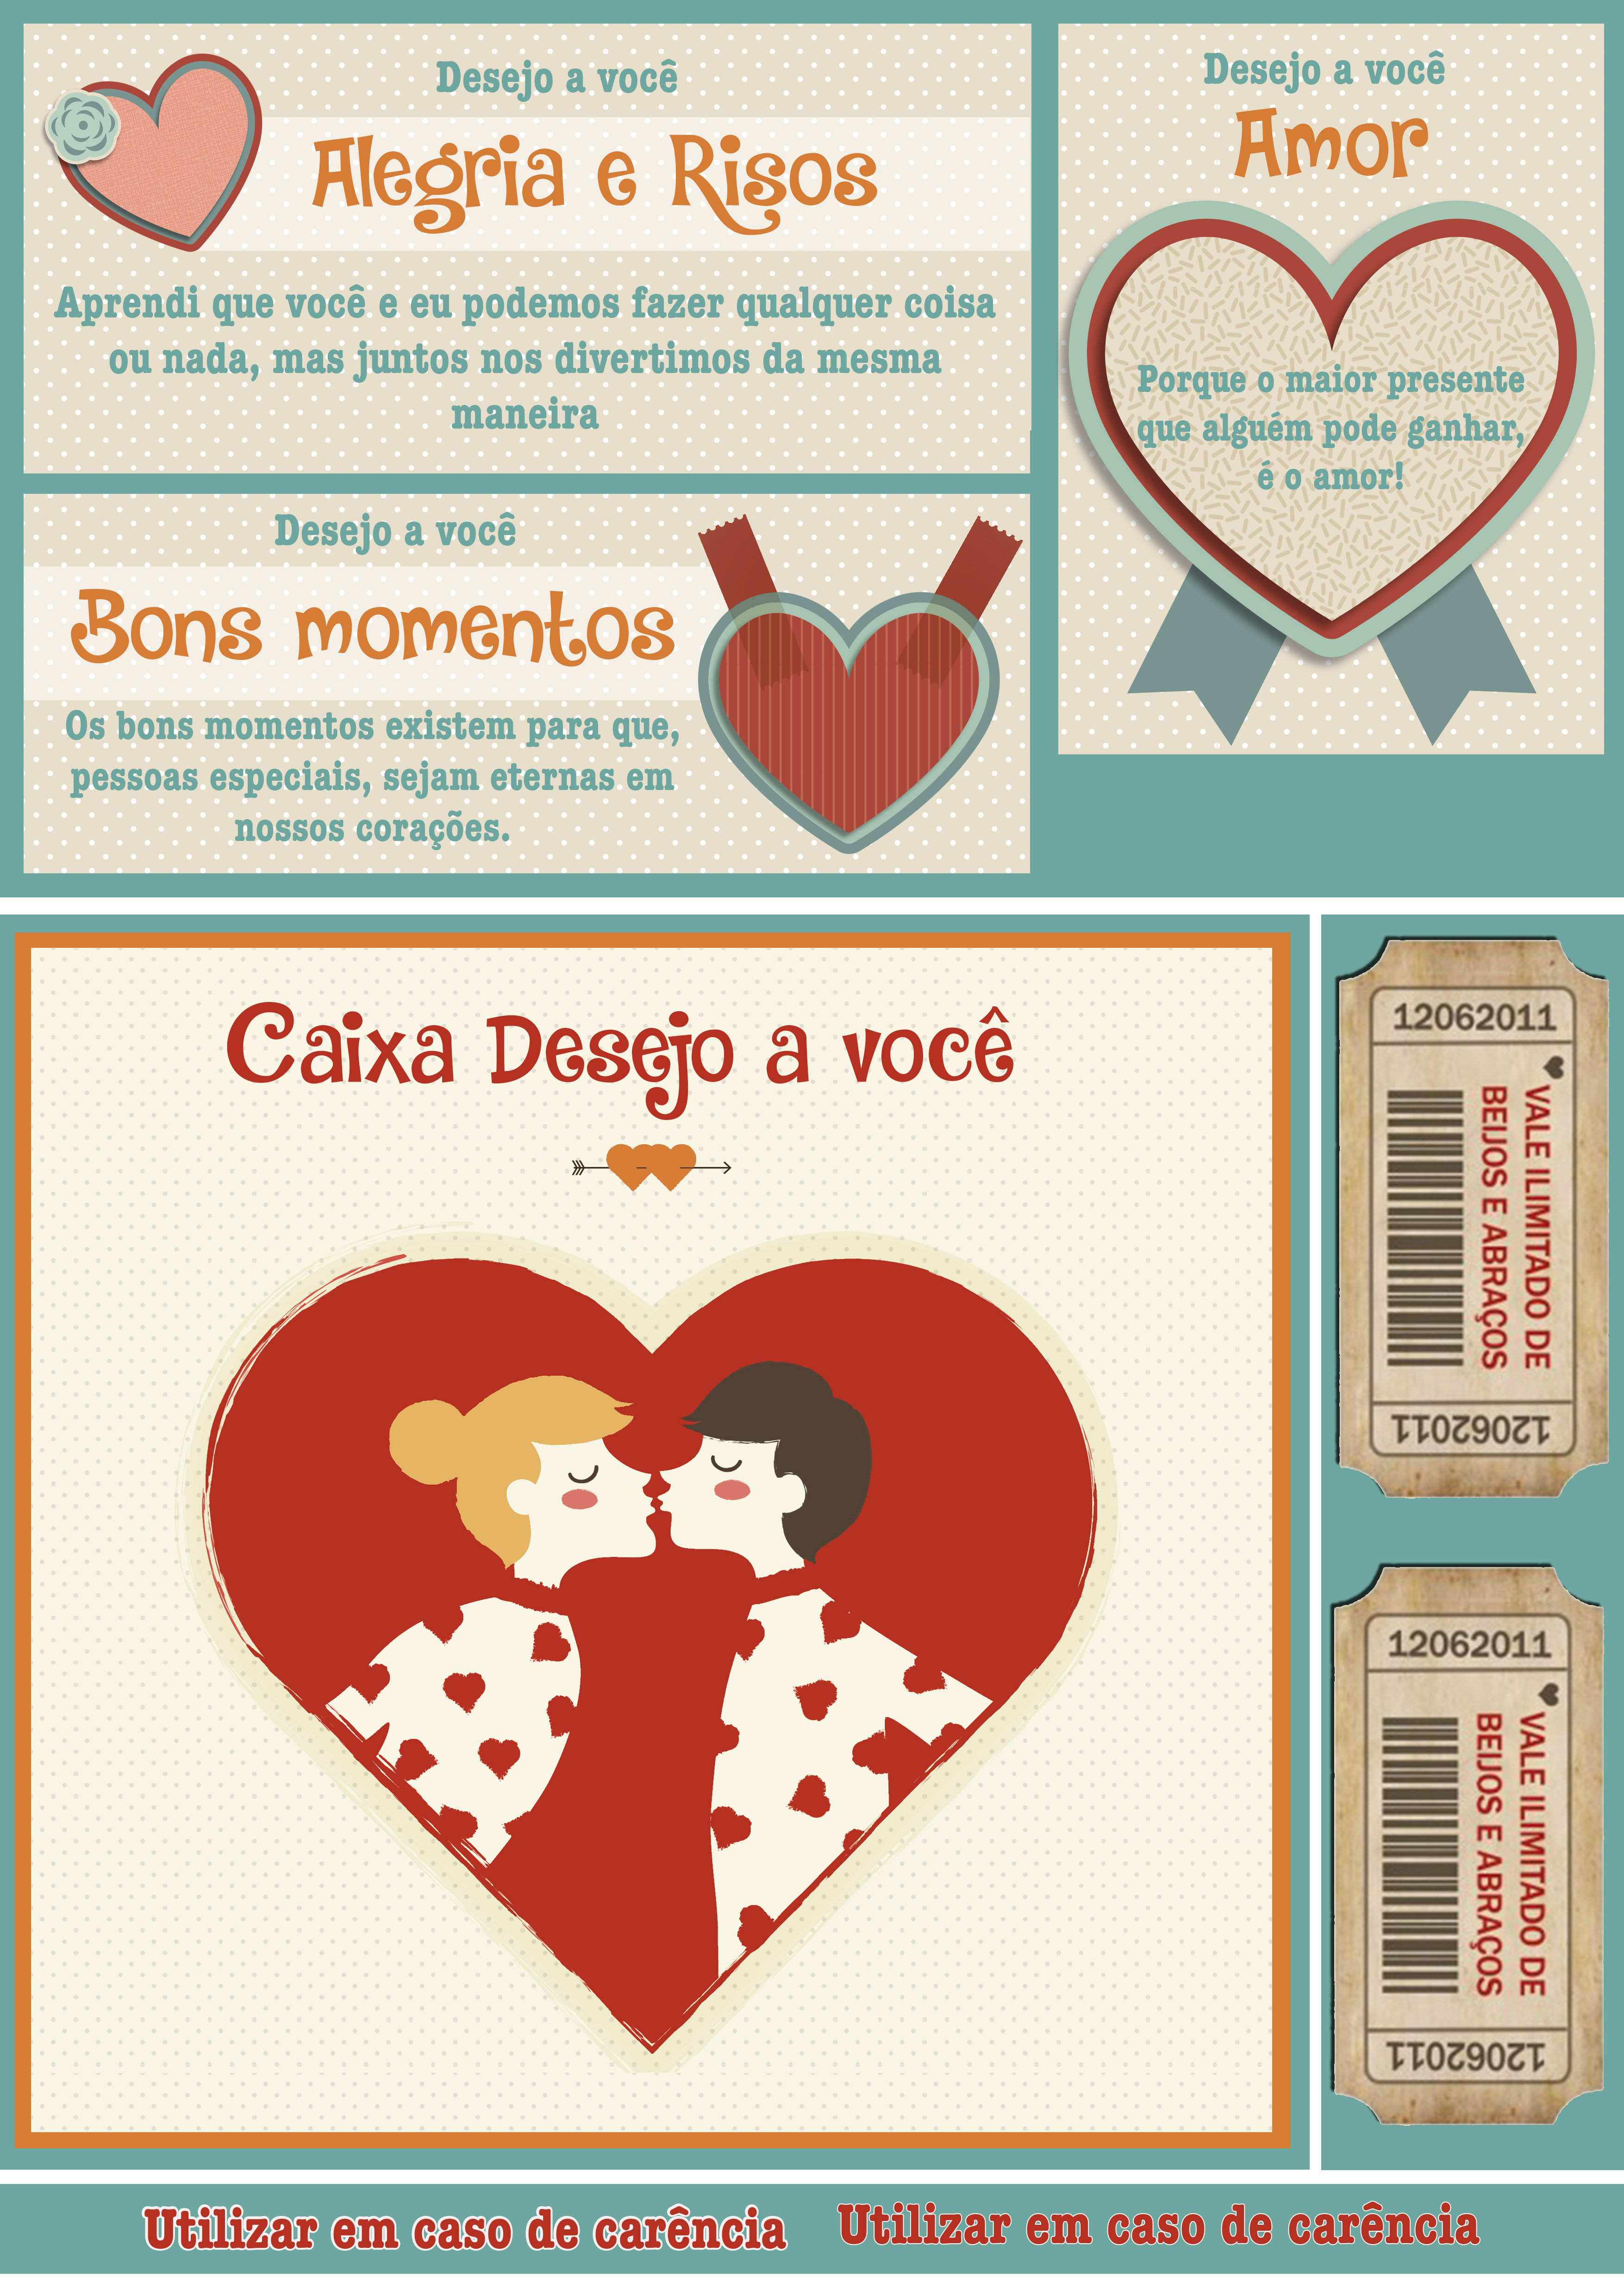 Coimbra Portugal  Rua69  Anuncios de relacionamentos